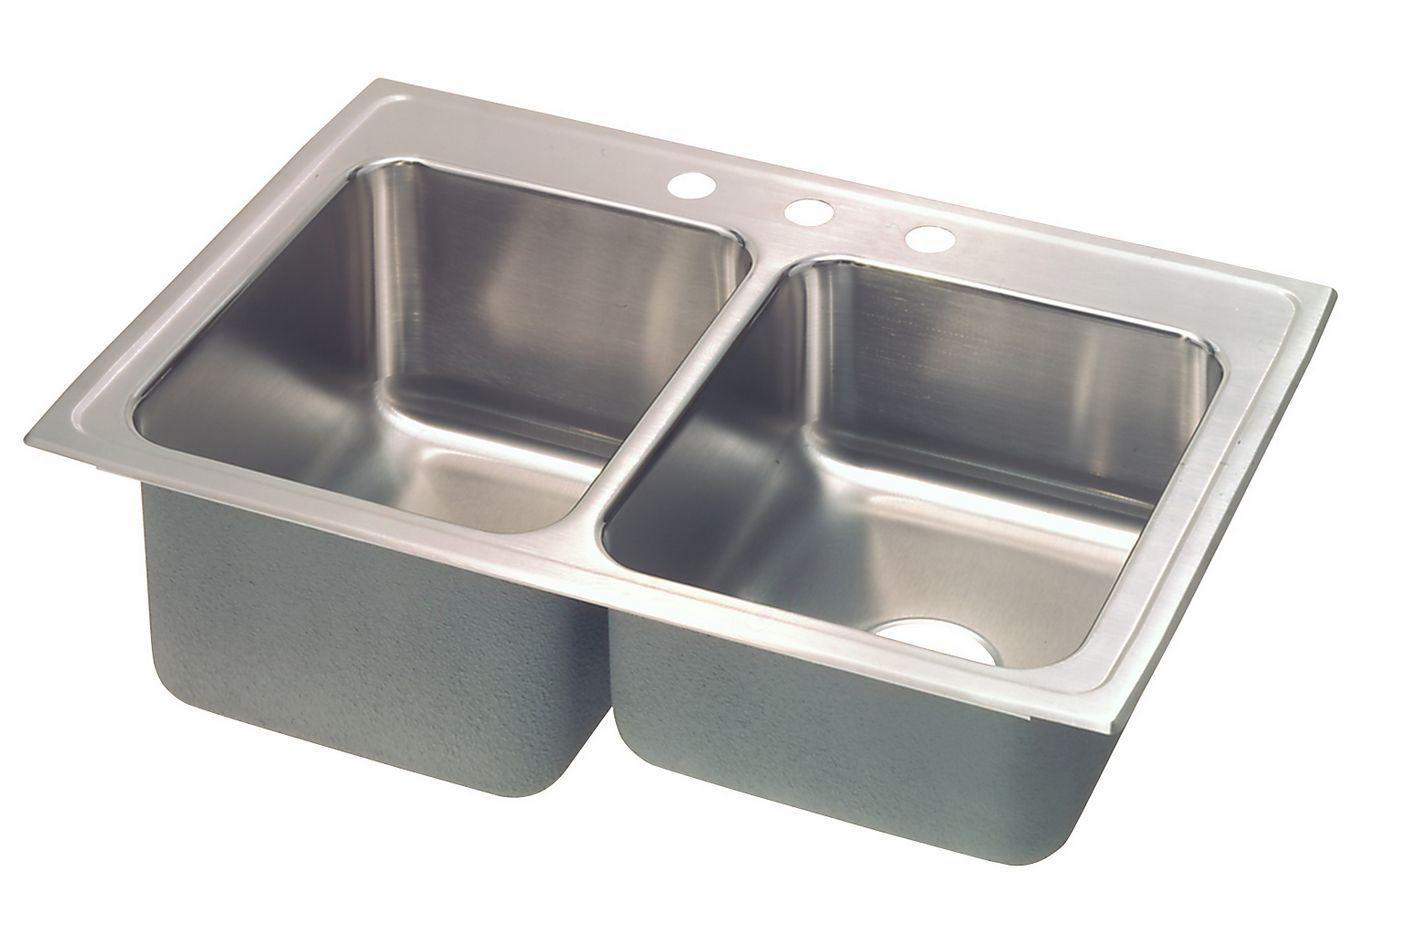 Fregadero de doble lavabo de acero inoxidable Franke contra un fondo blanco